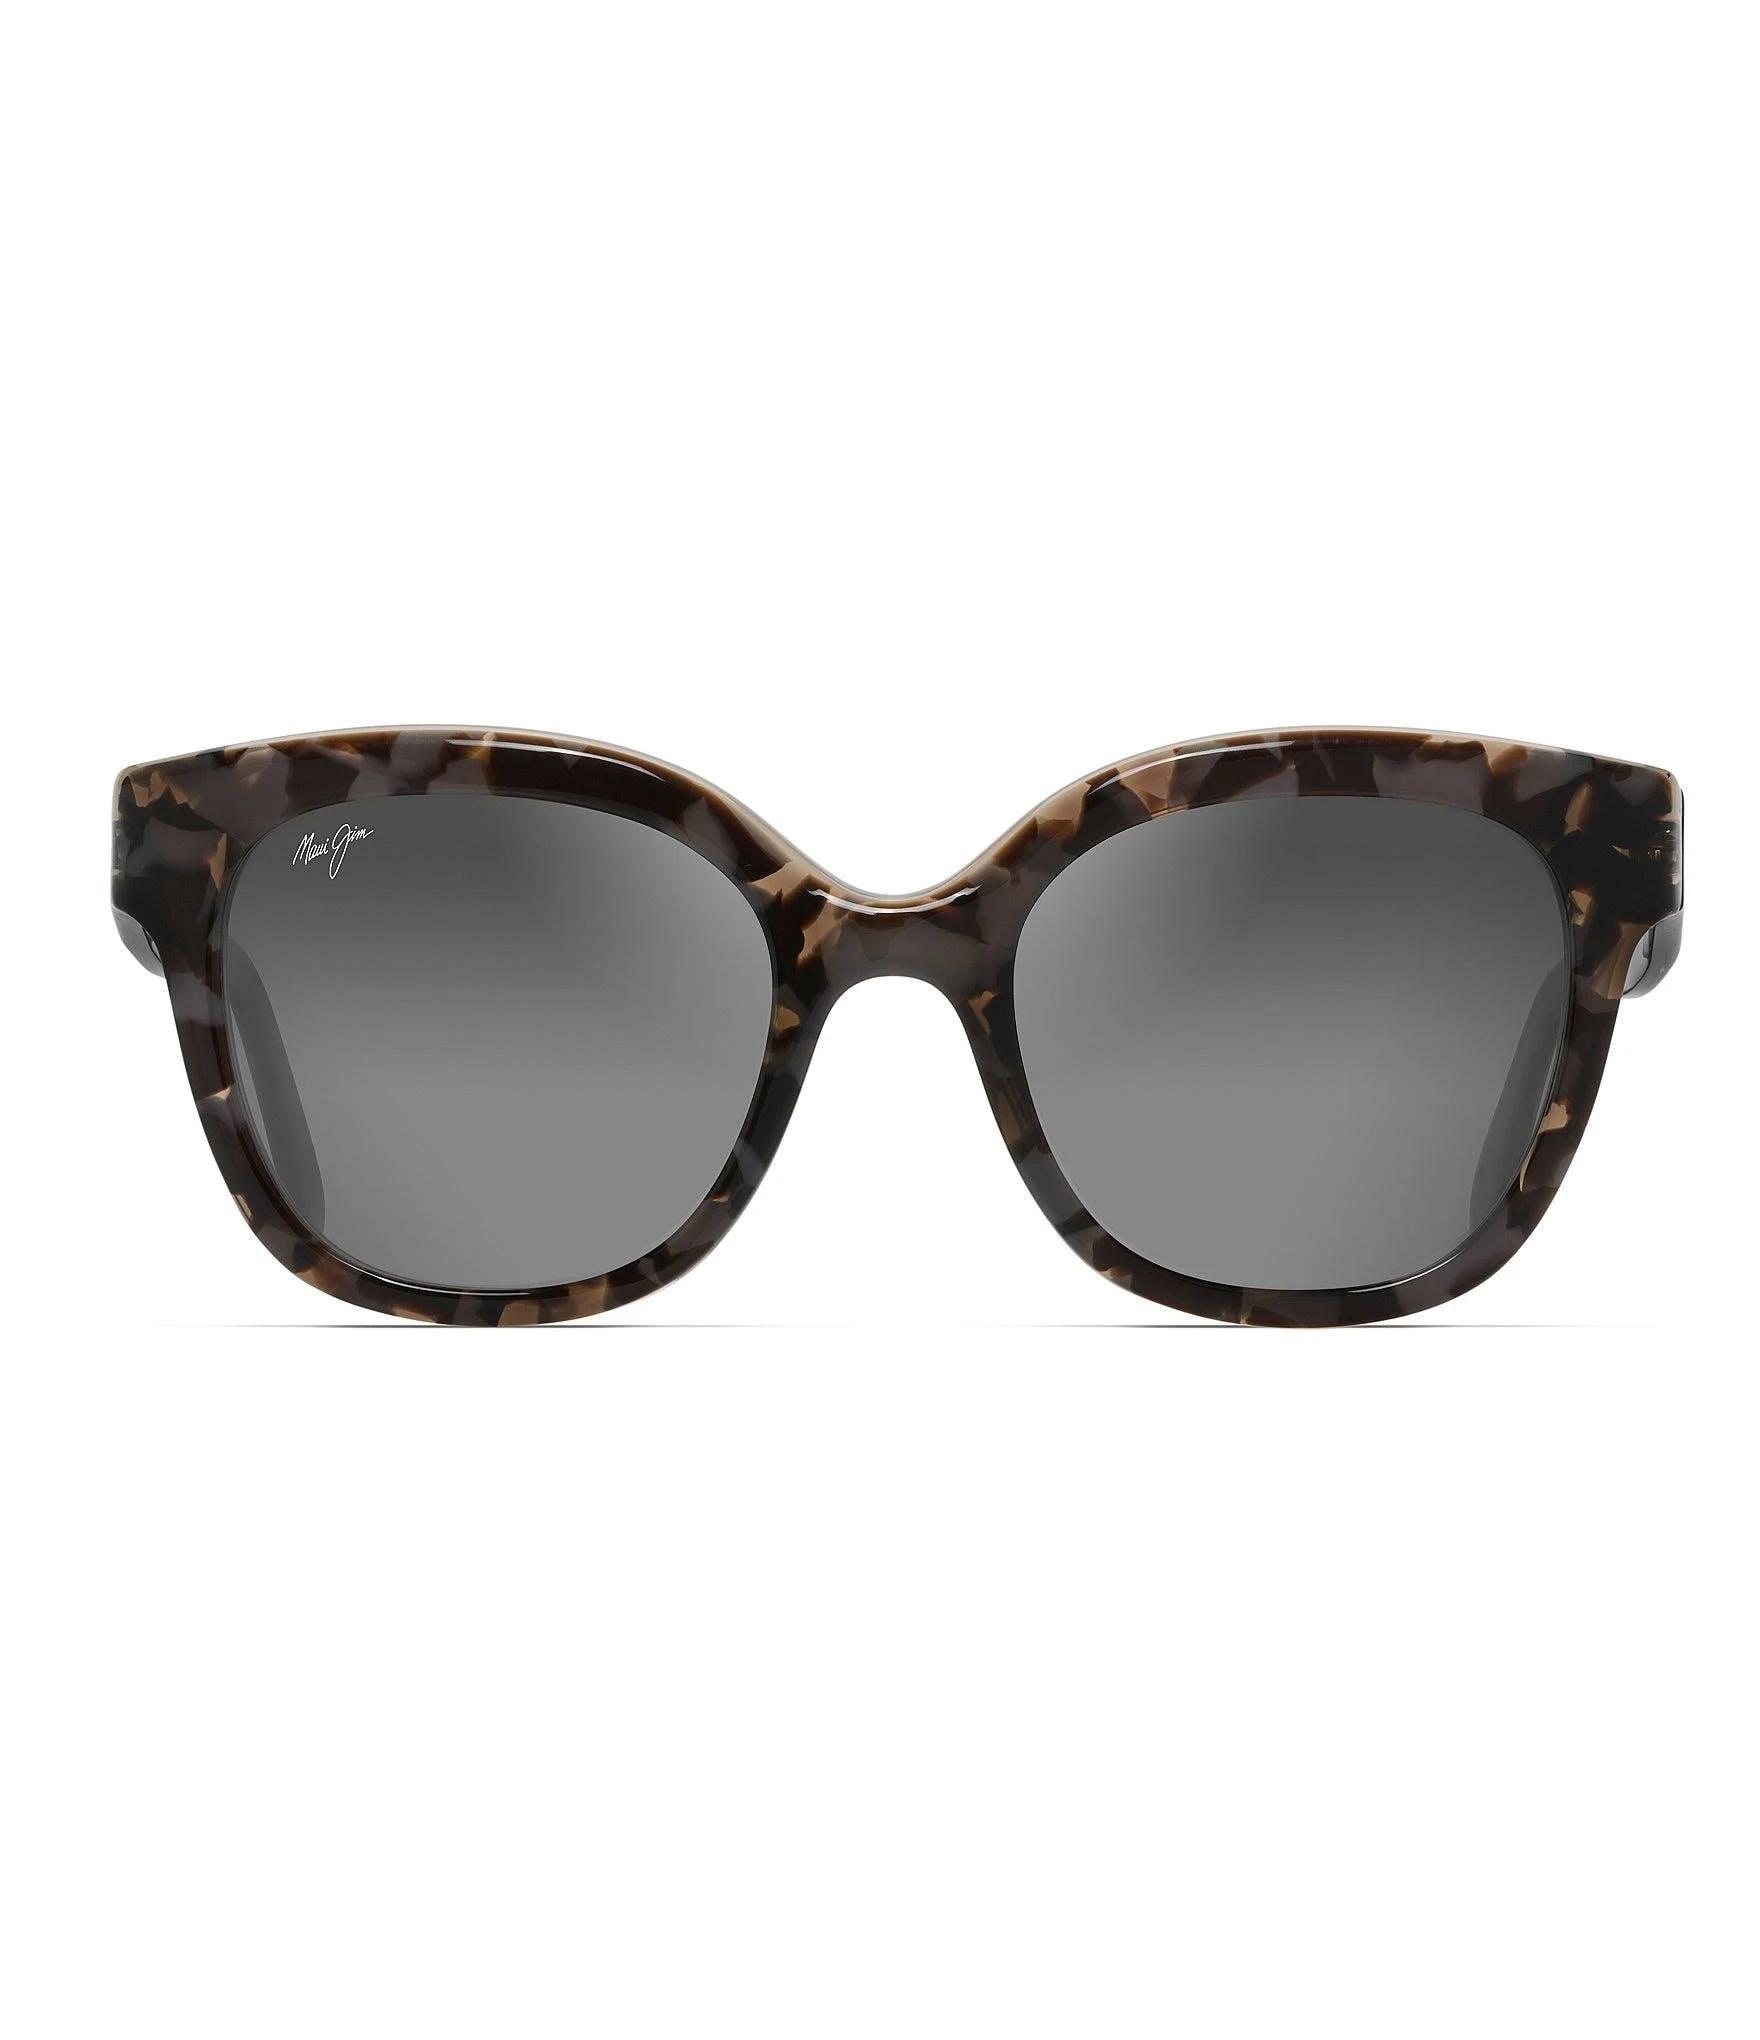 Maui Jim Honey Girl Sunglasses Dove Grey / Neutral Grey